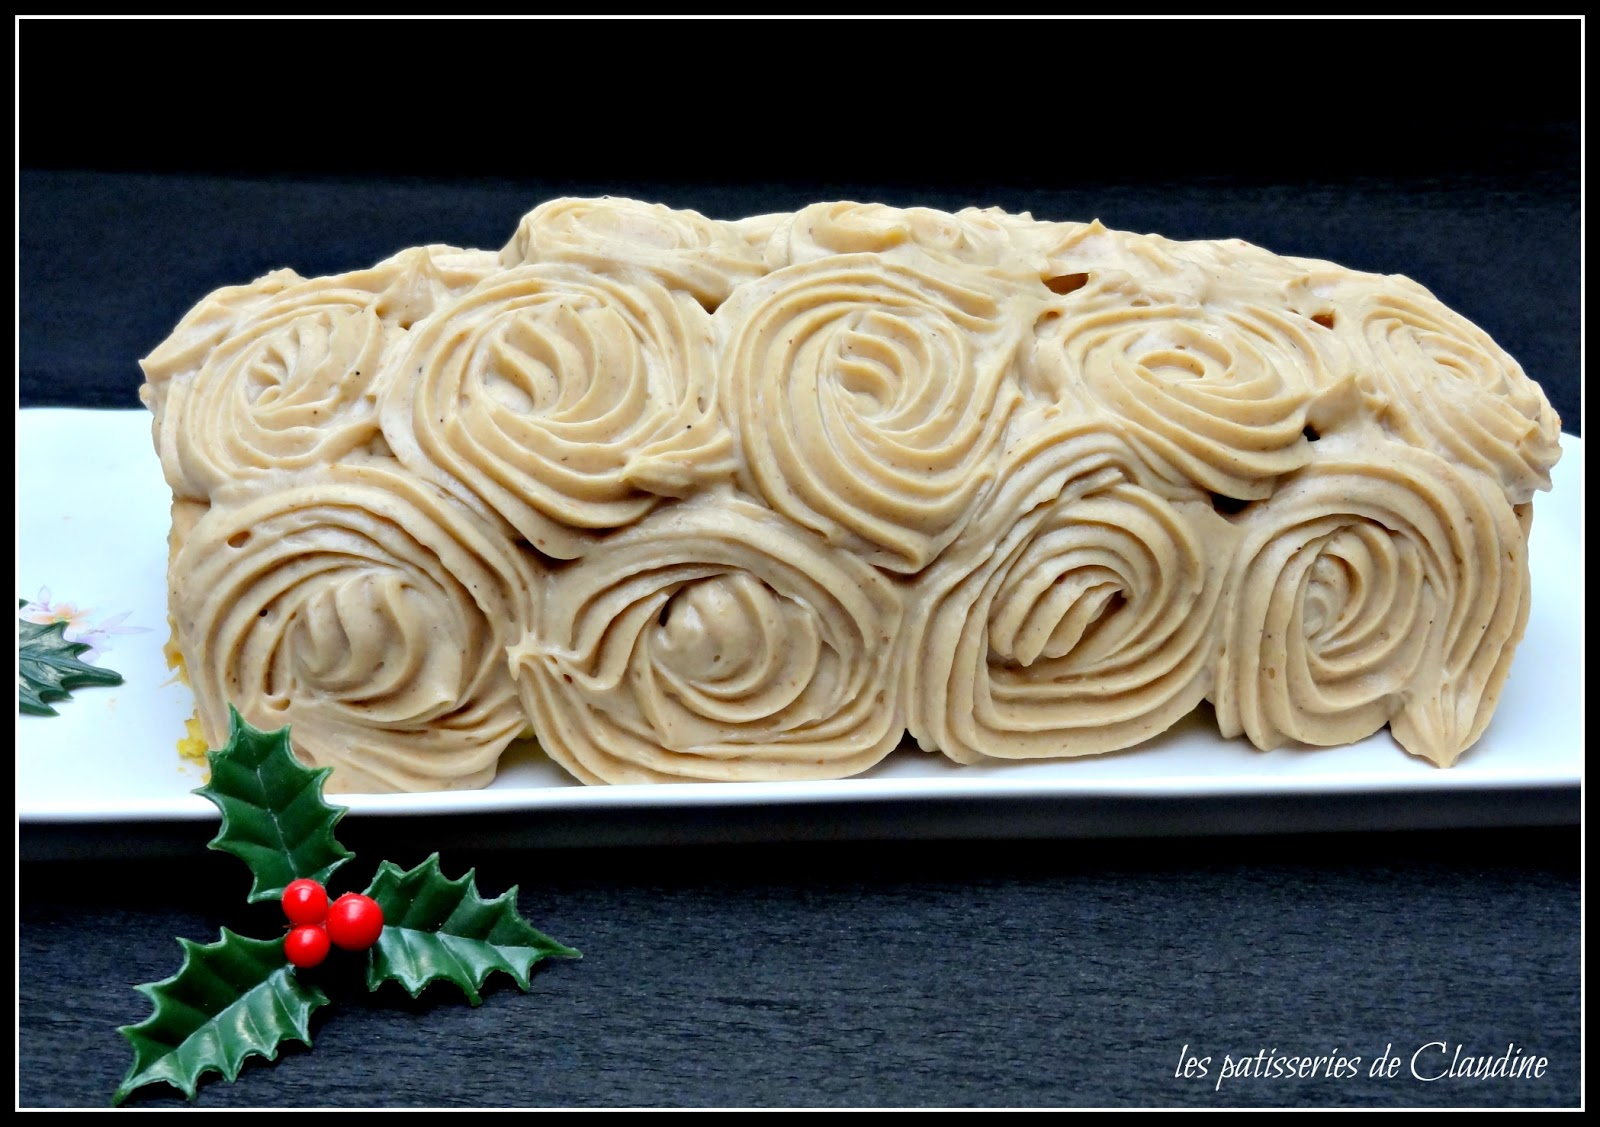 Les Patisseries De Claudine Buche De Noel A La Creme De Marrons